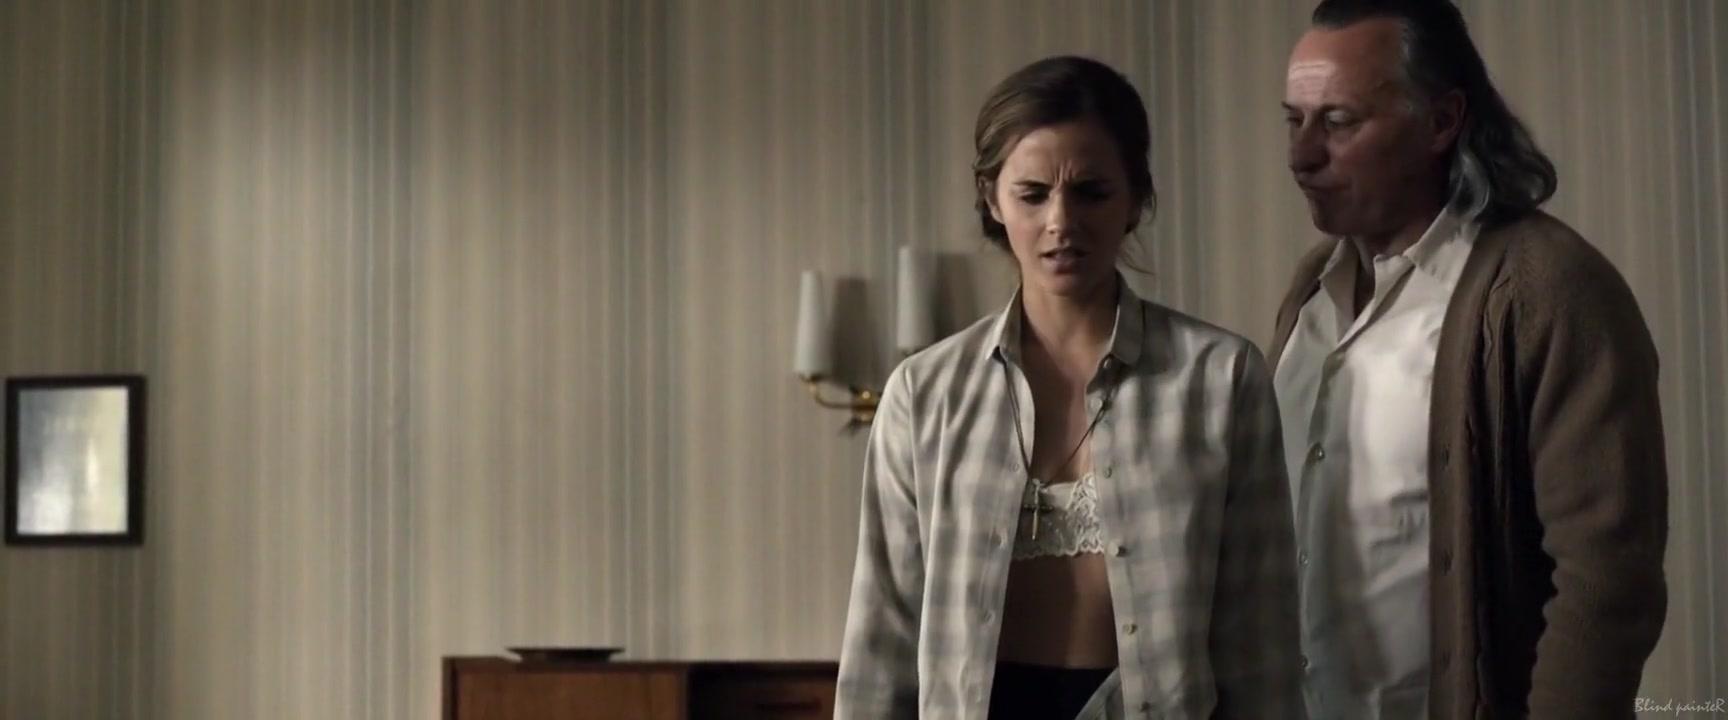 Colonia (2015) Emma Watson Pussy cunt fuck